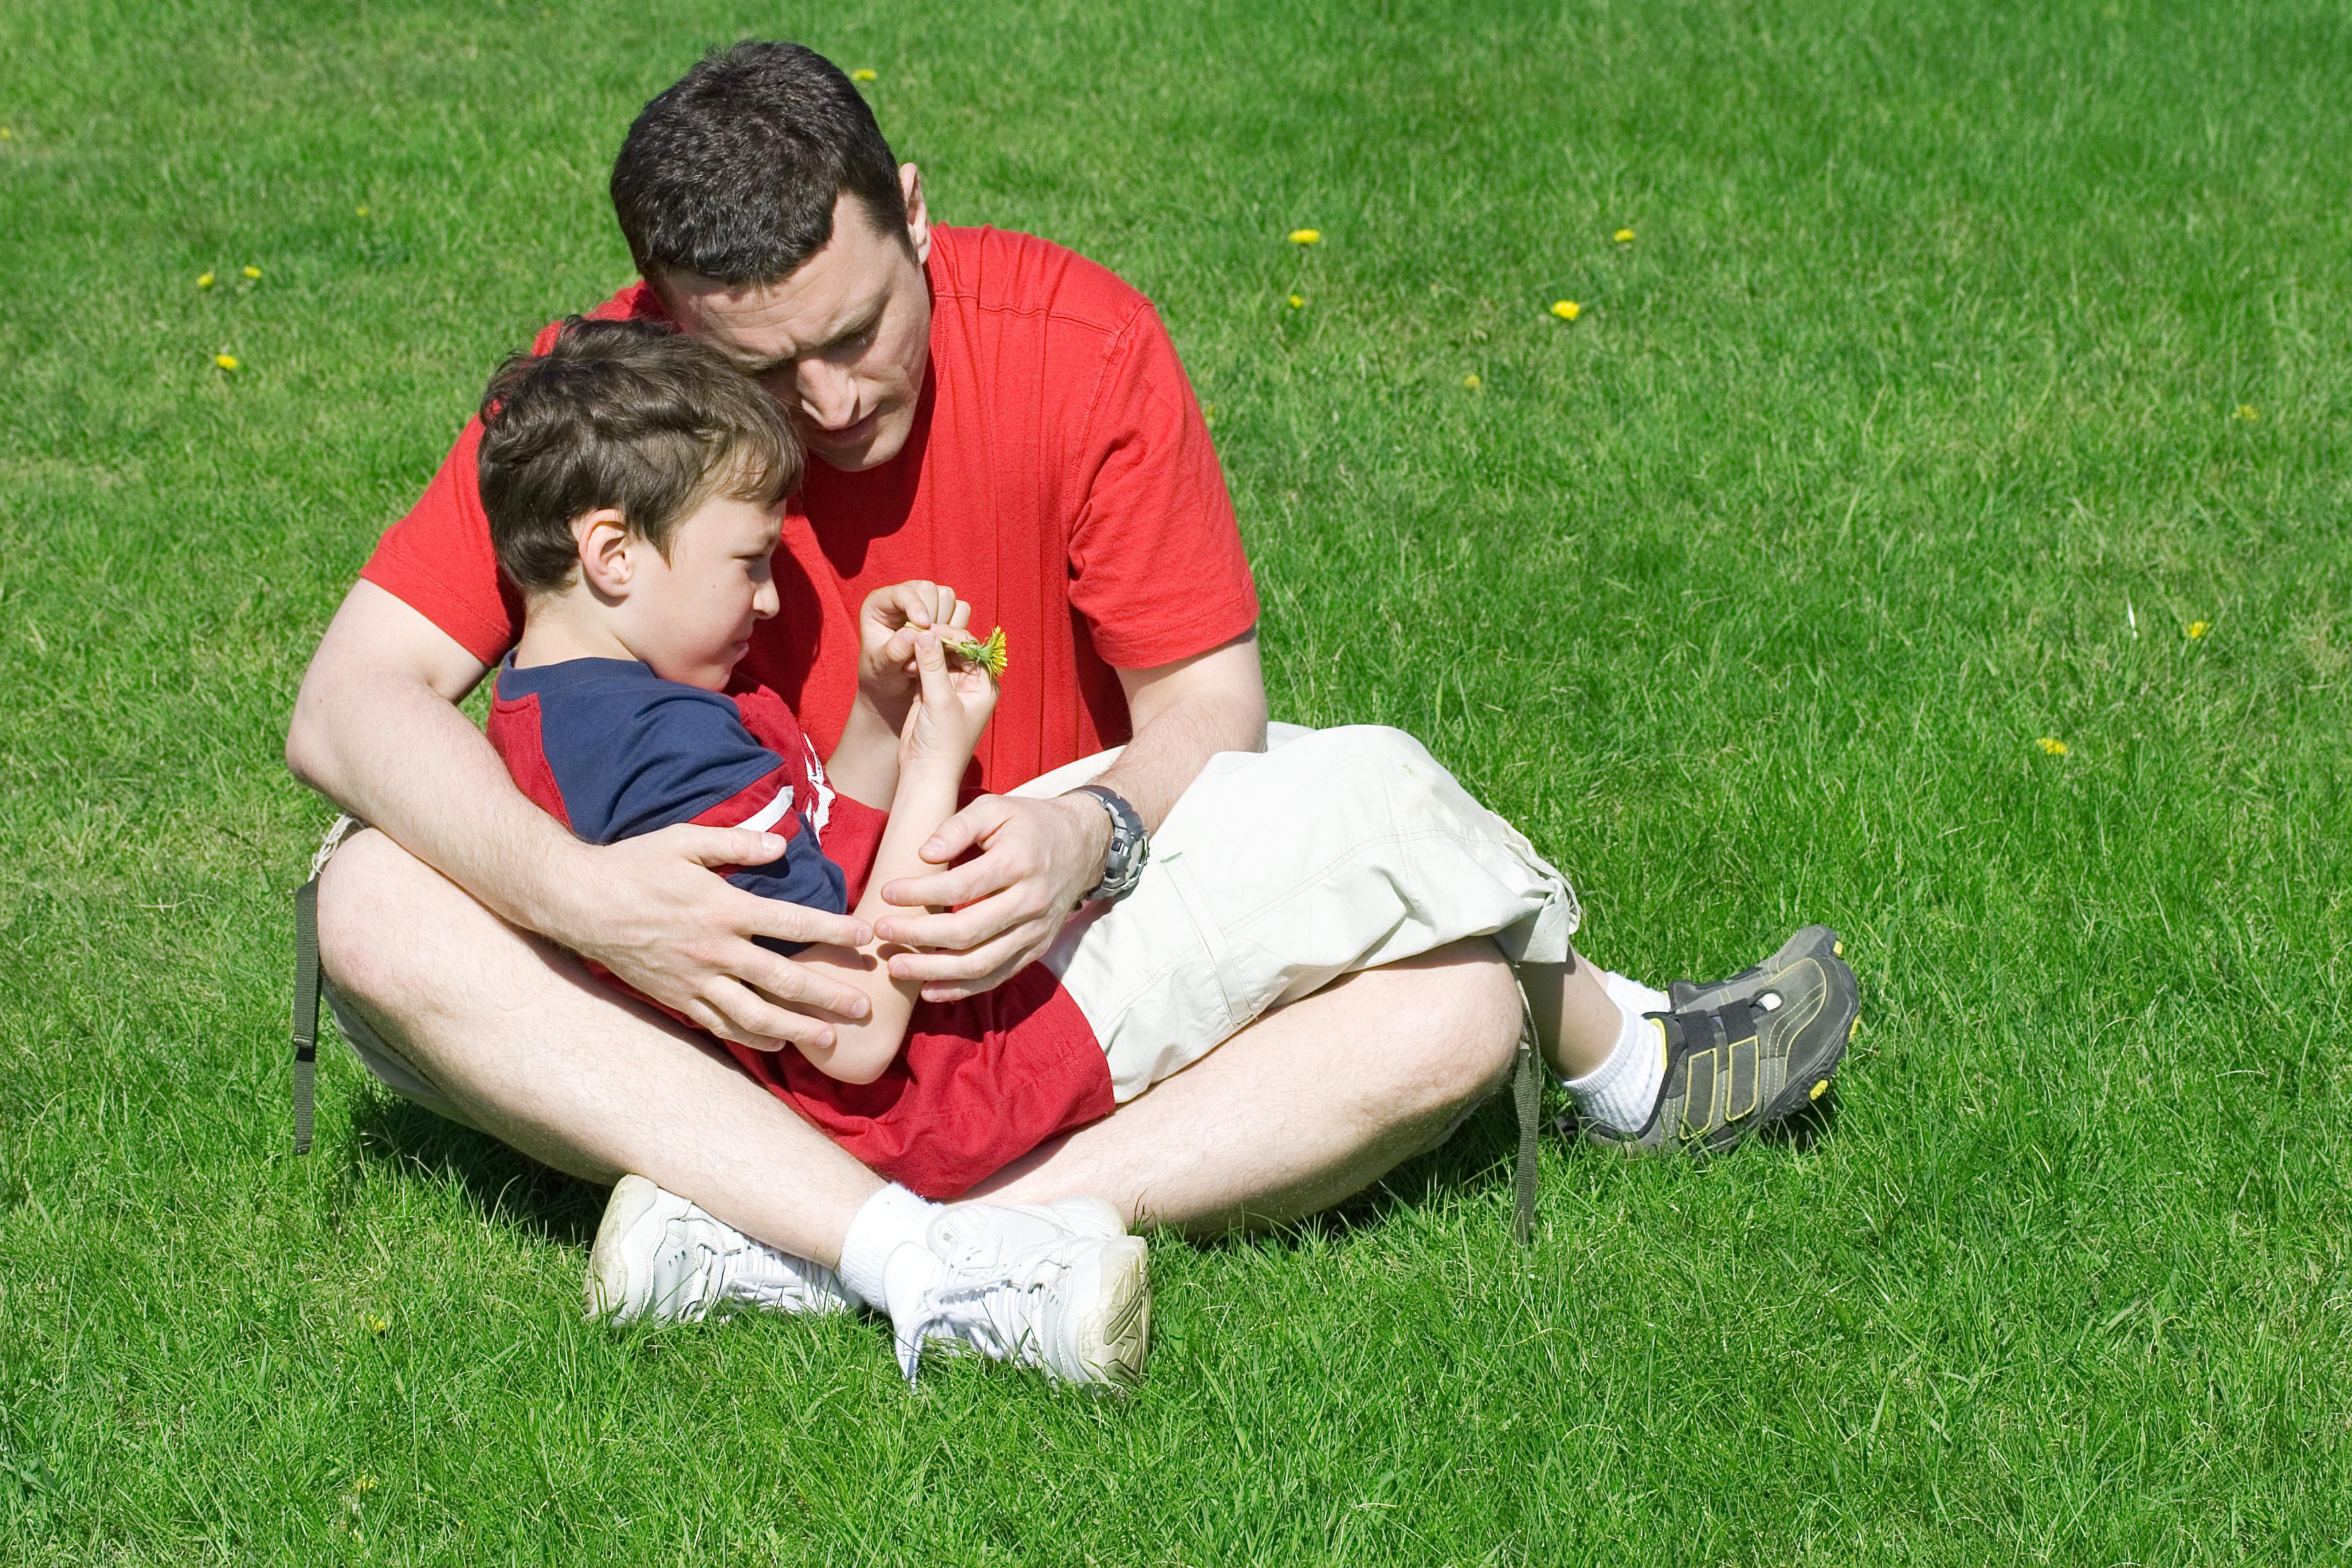 Is preschooler's odd behavior a sign of OCD?